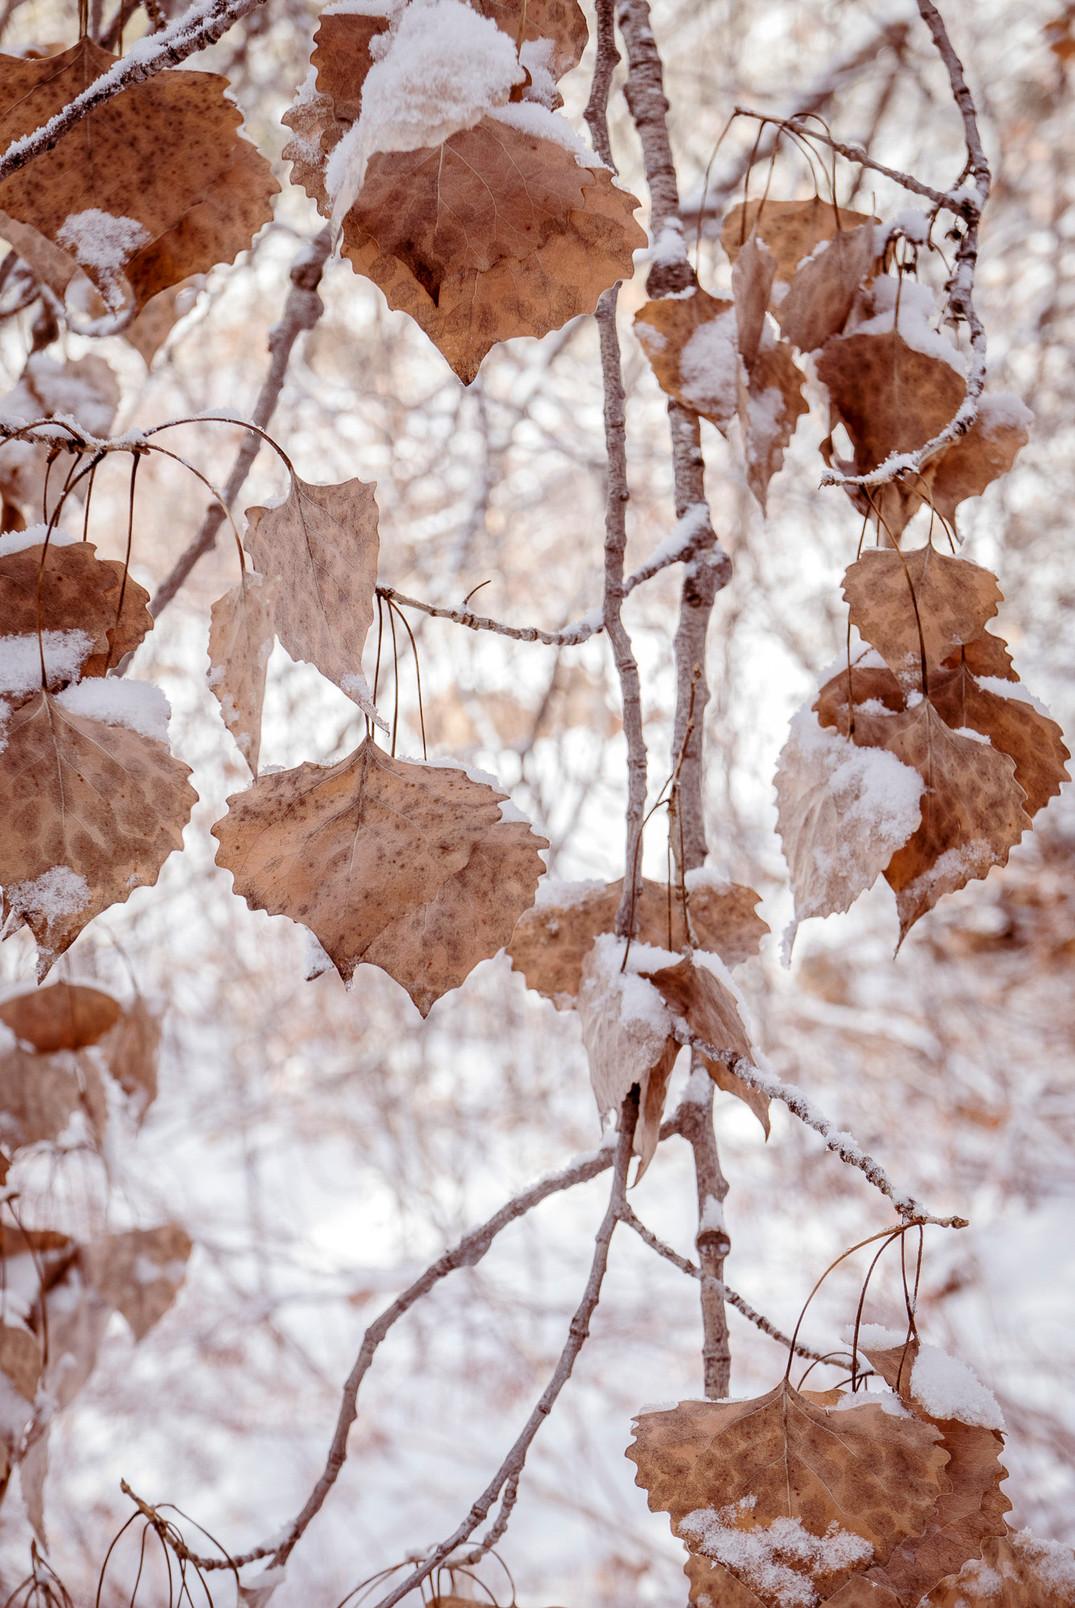 Siddho-Photography-Nature-C-1.jpg